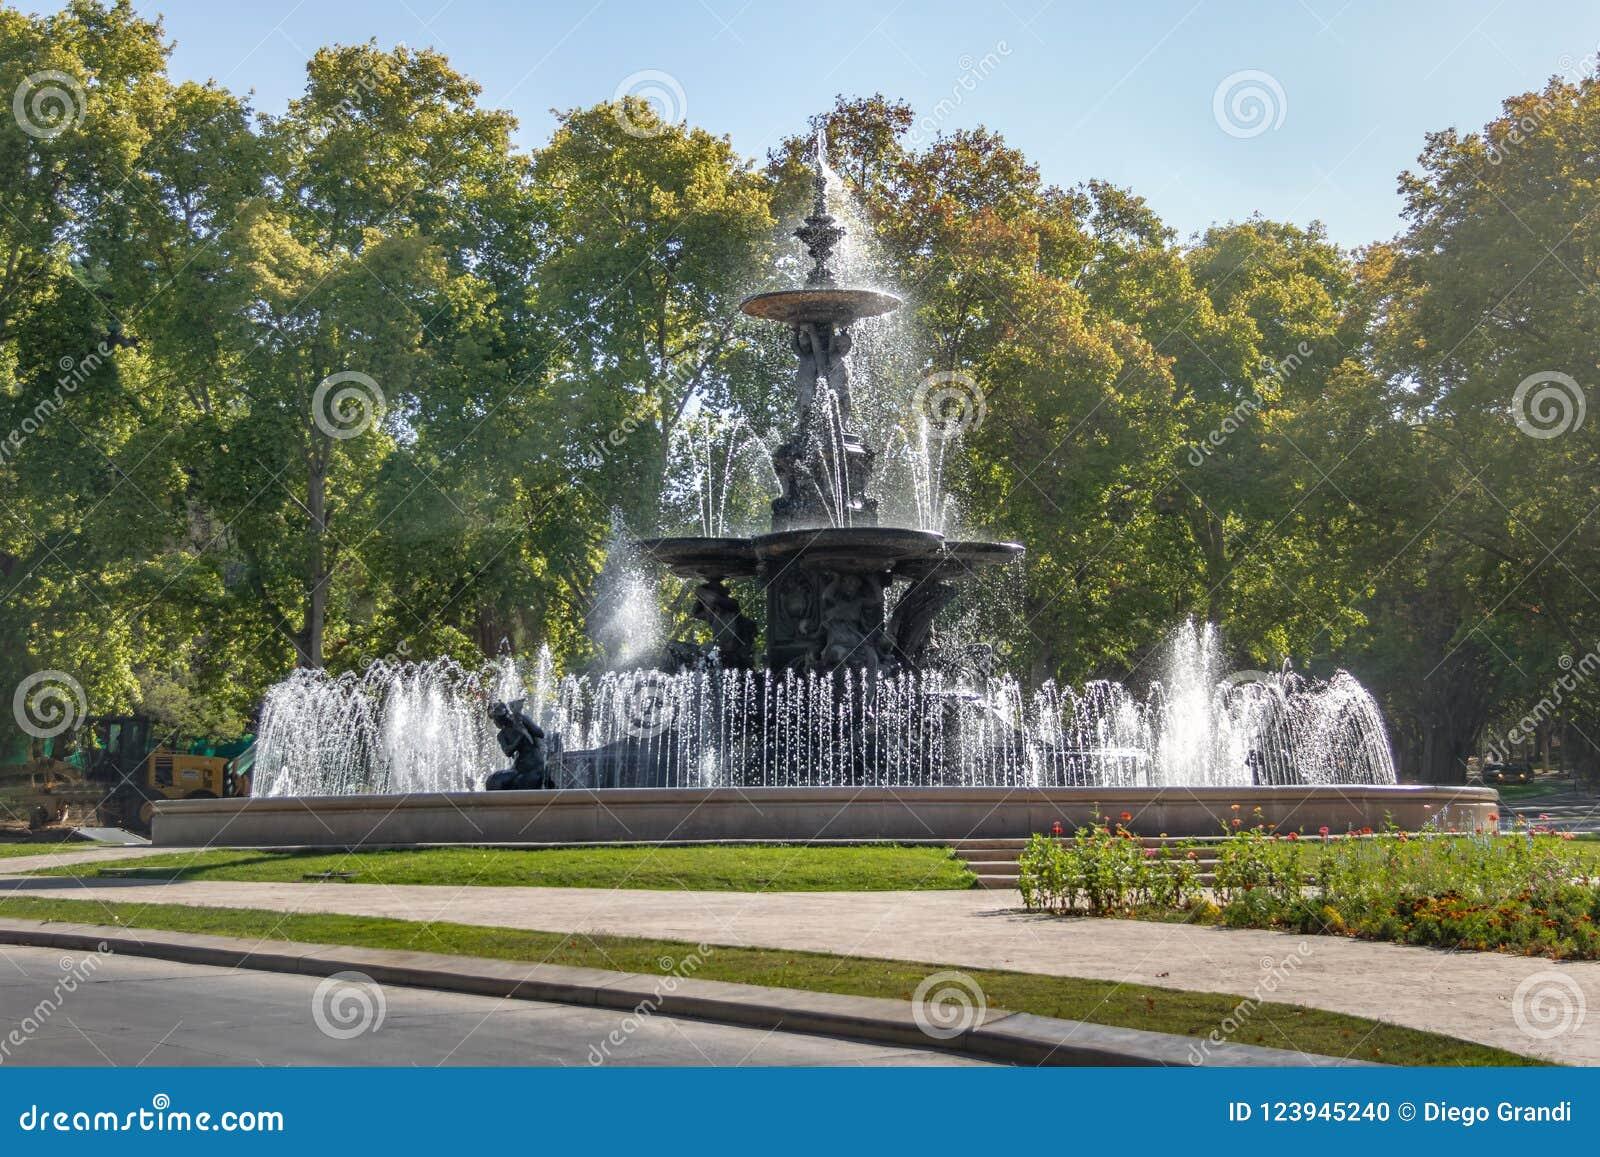 大陆Fuente de在圣马丁将军公园的los Continentes - Mendoza,阿根廷的喷泉